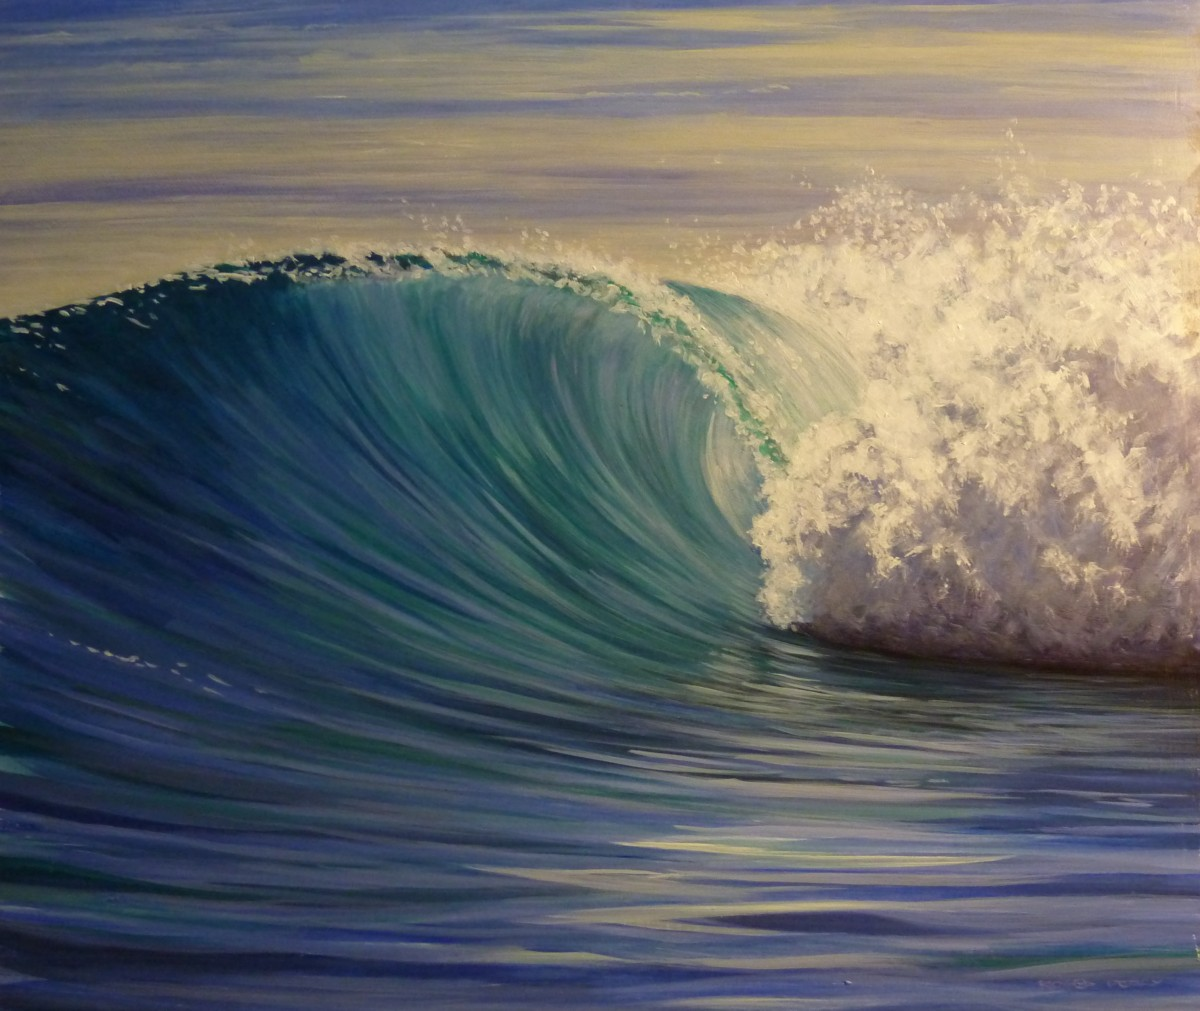 Roger Percy – My Art